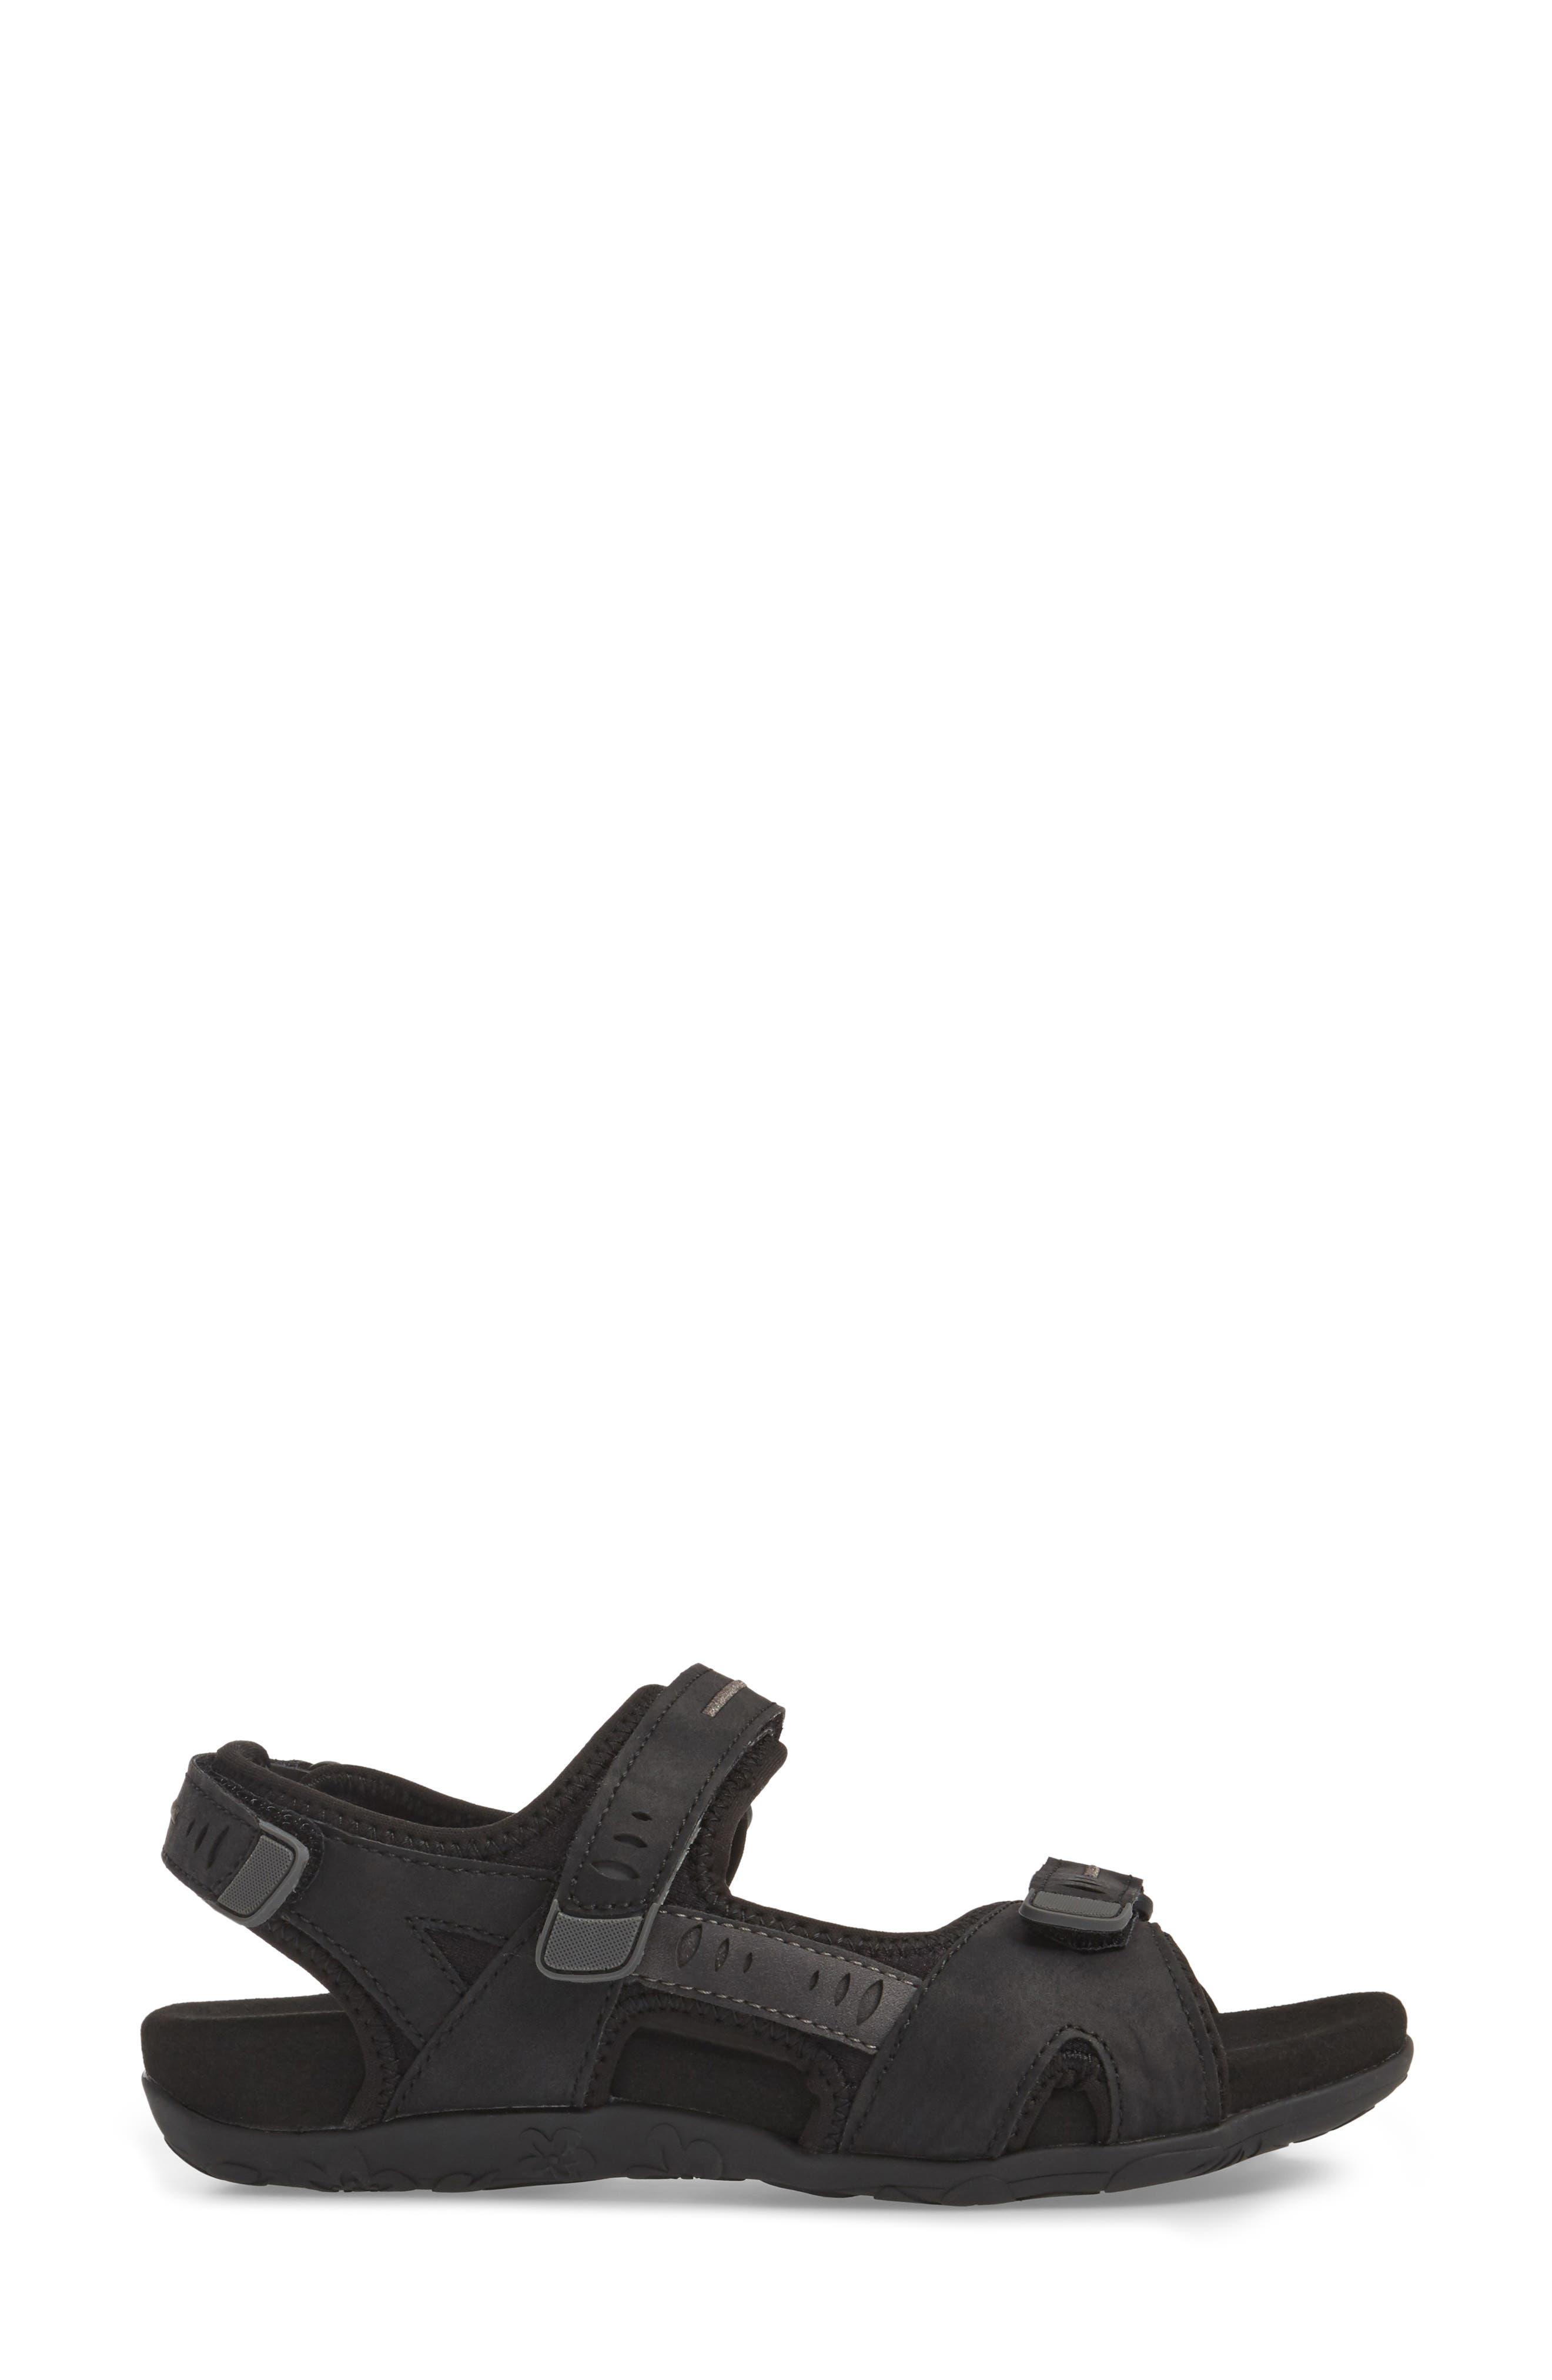 Bree Sport Sandal,                             Alternate thumbnail 3, color,                             001